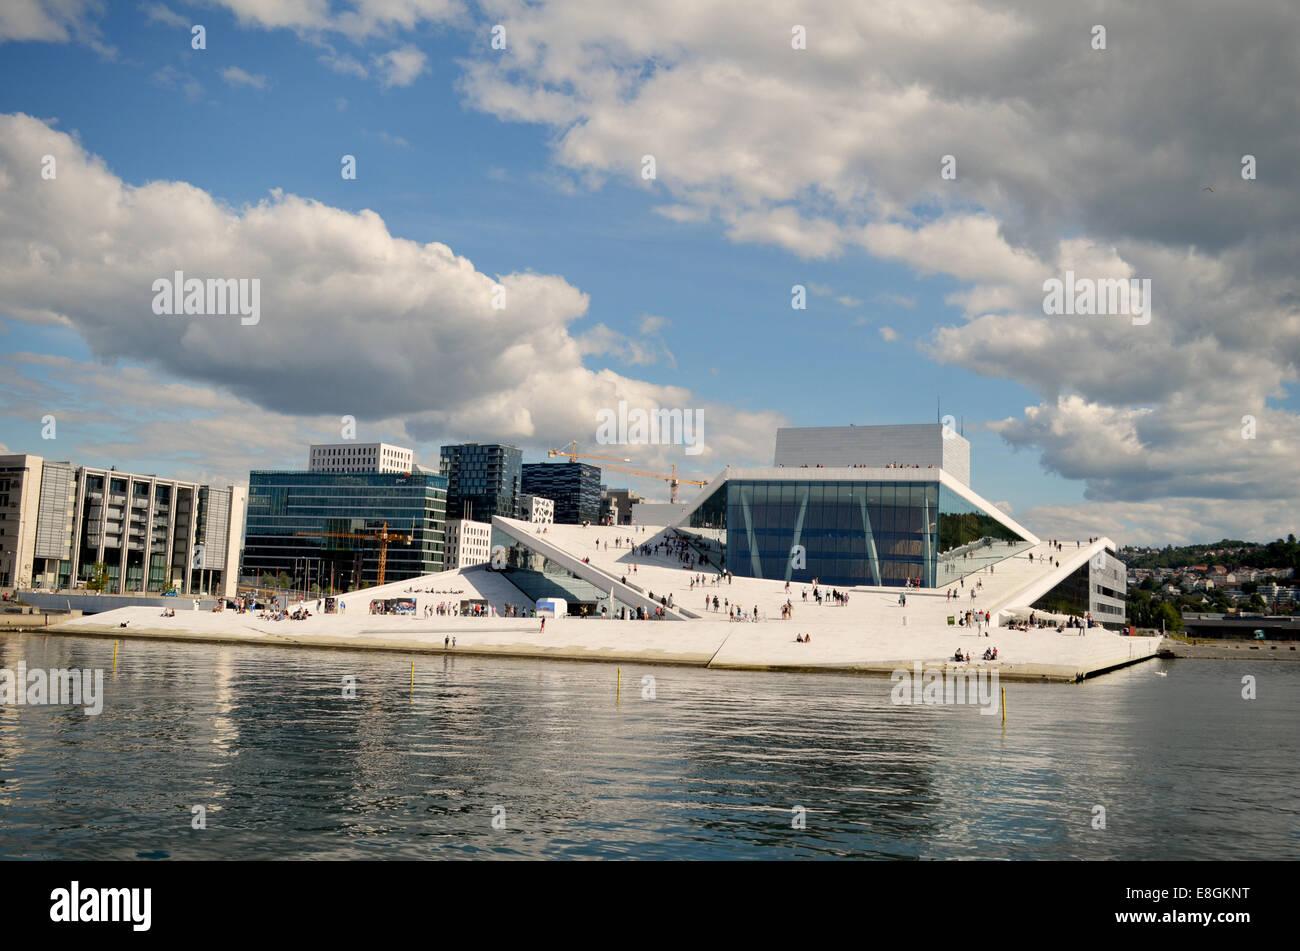 Oslo, Norway Oslo Opera House - Stock Image